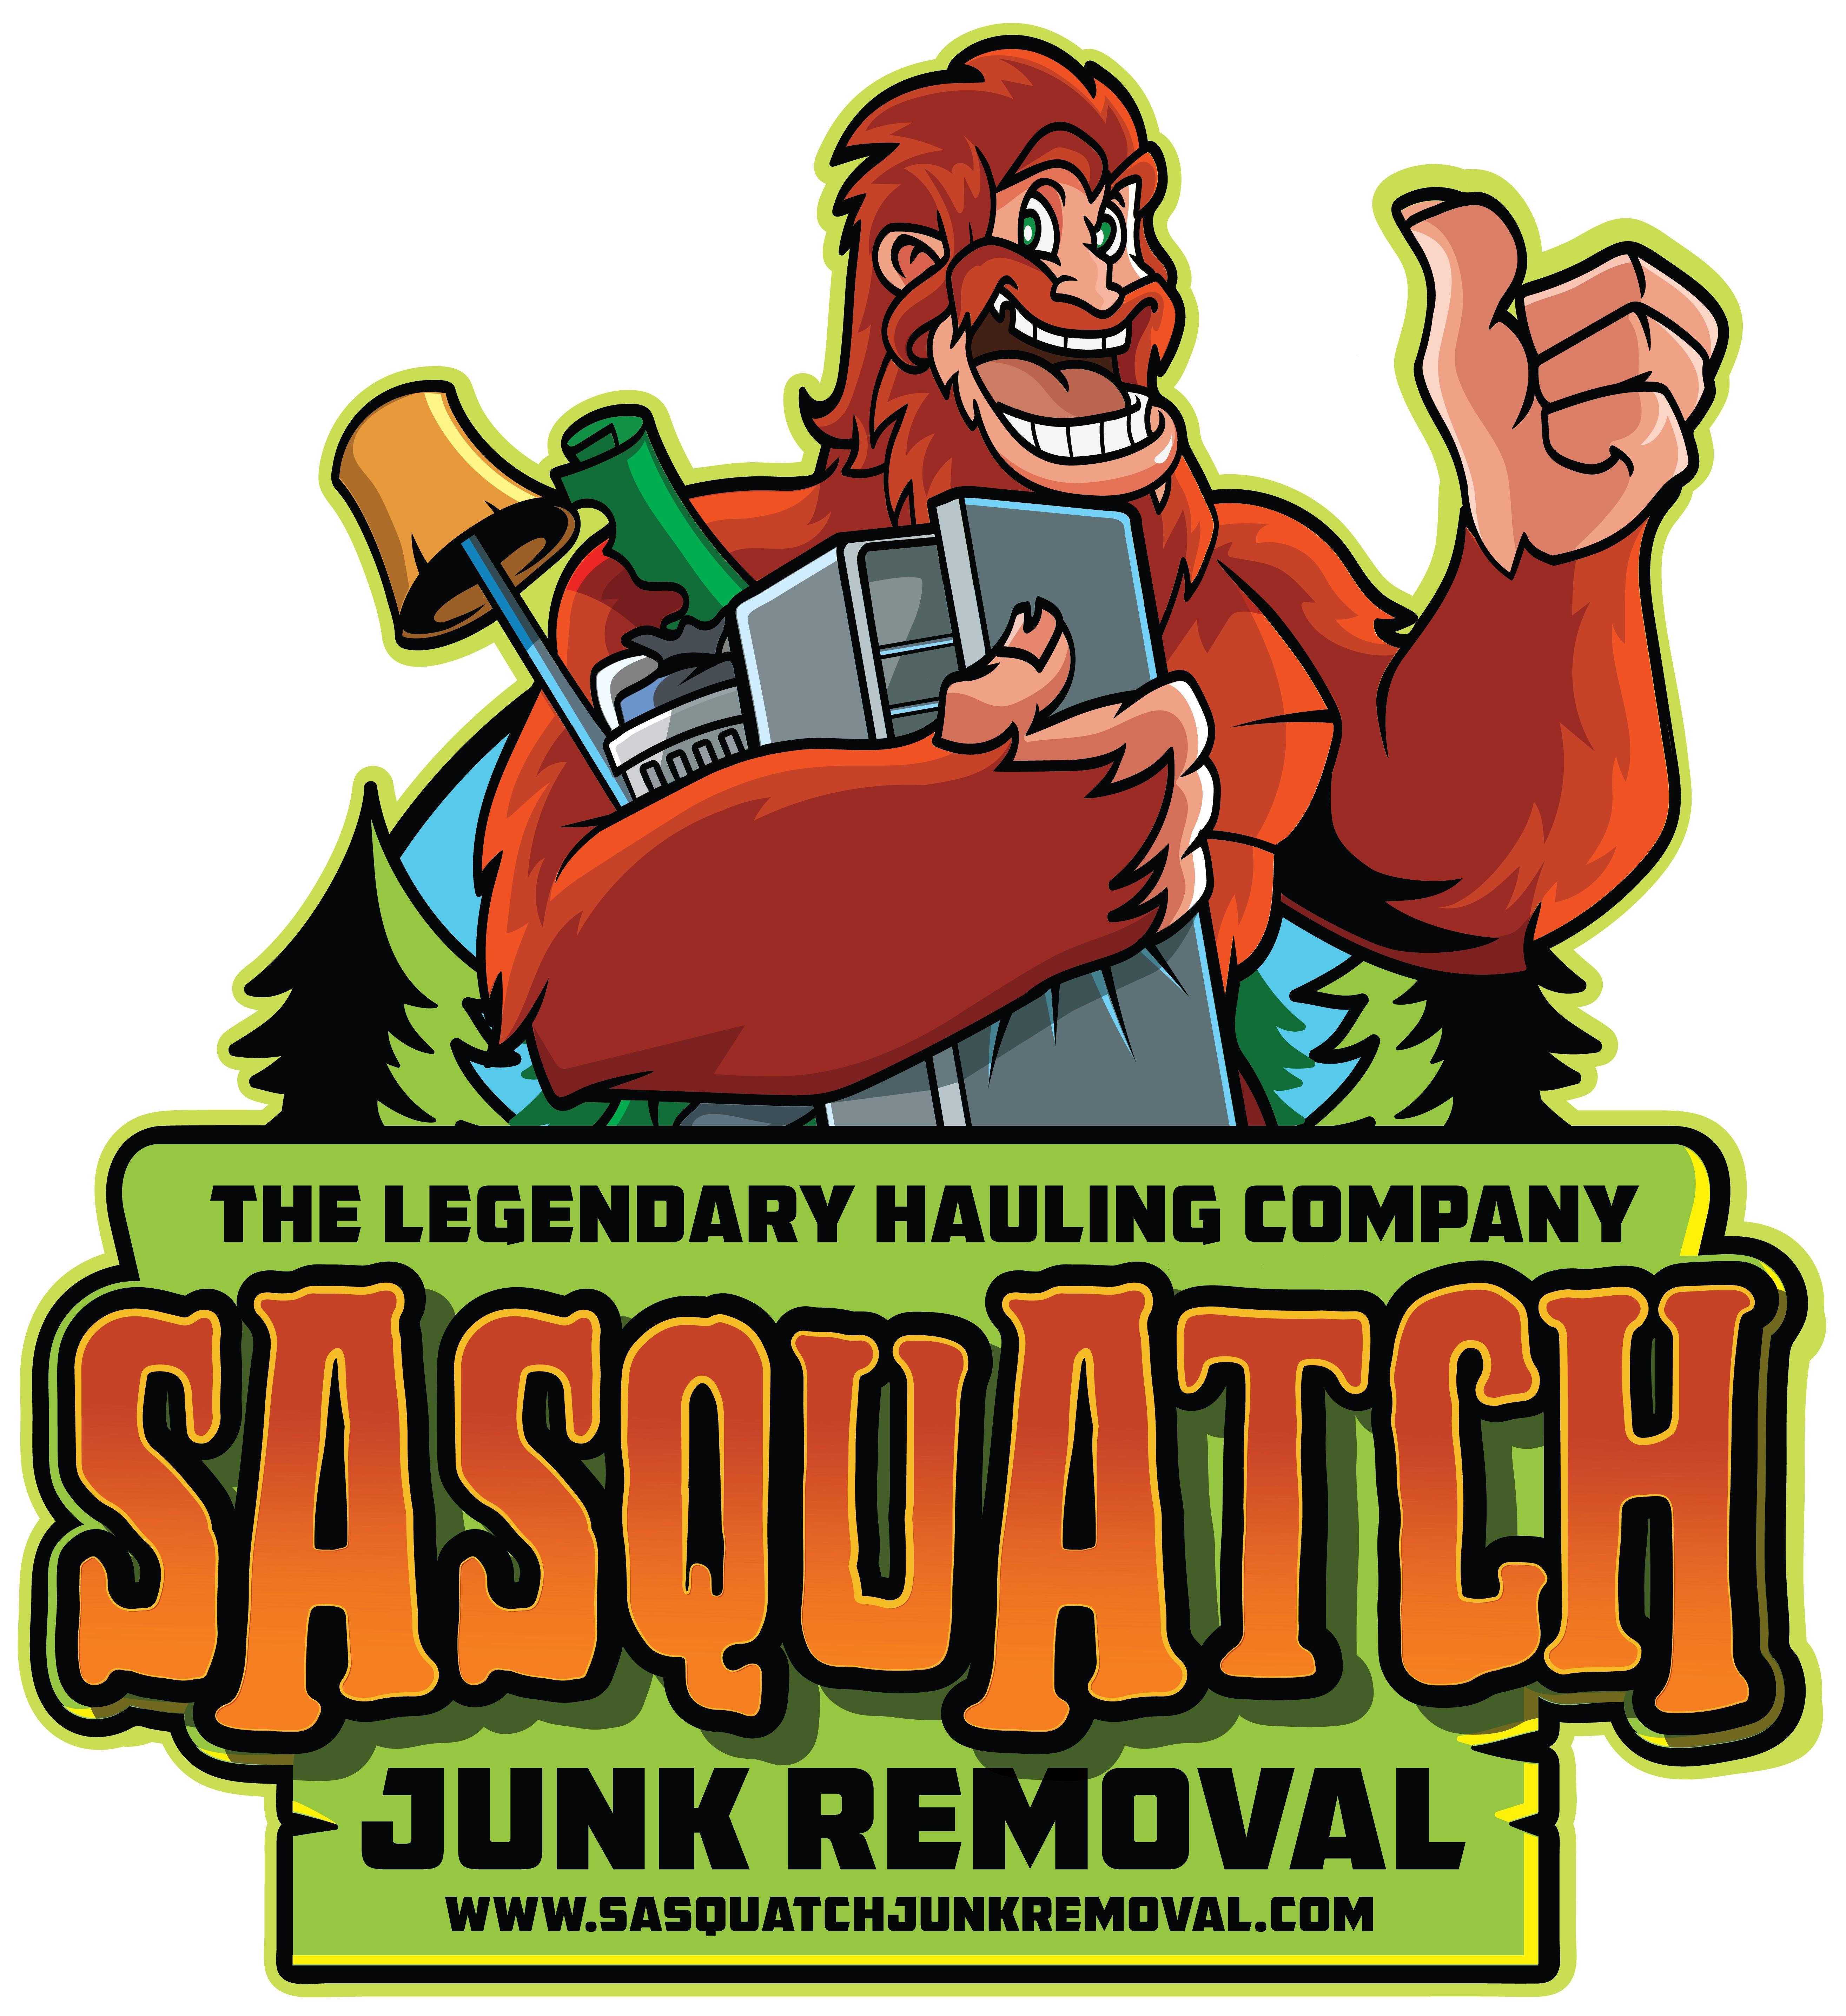 SASQUATCH! Design a fun Junk Removal logo for an expanding company!